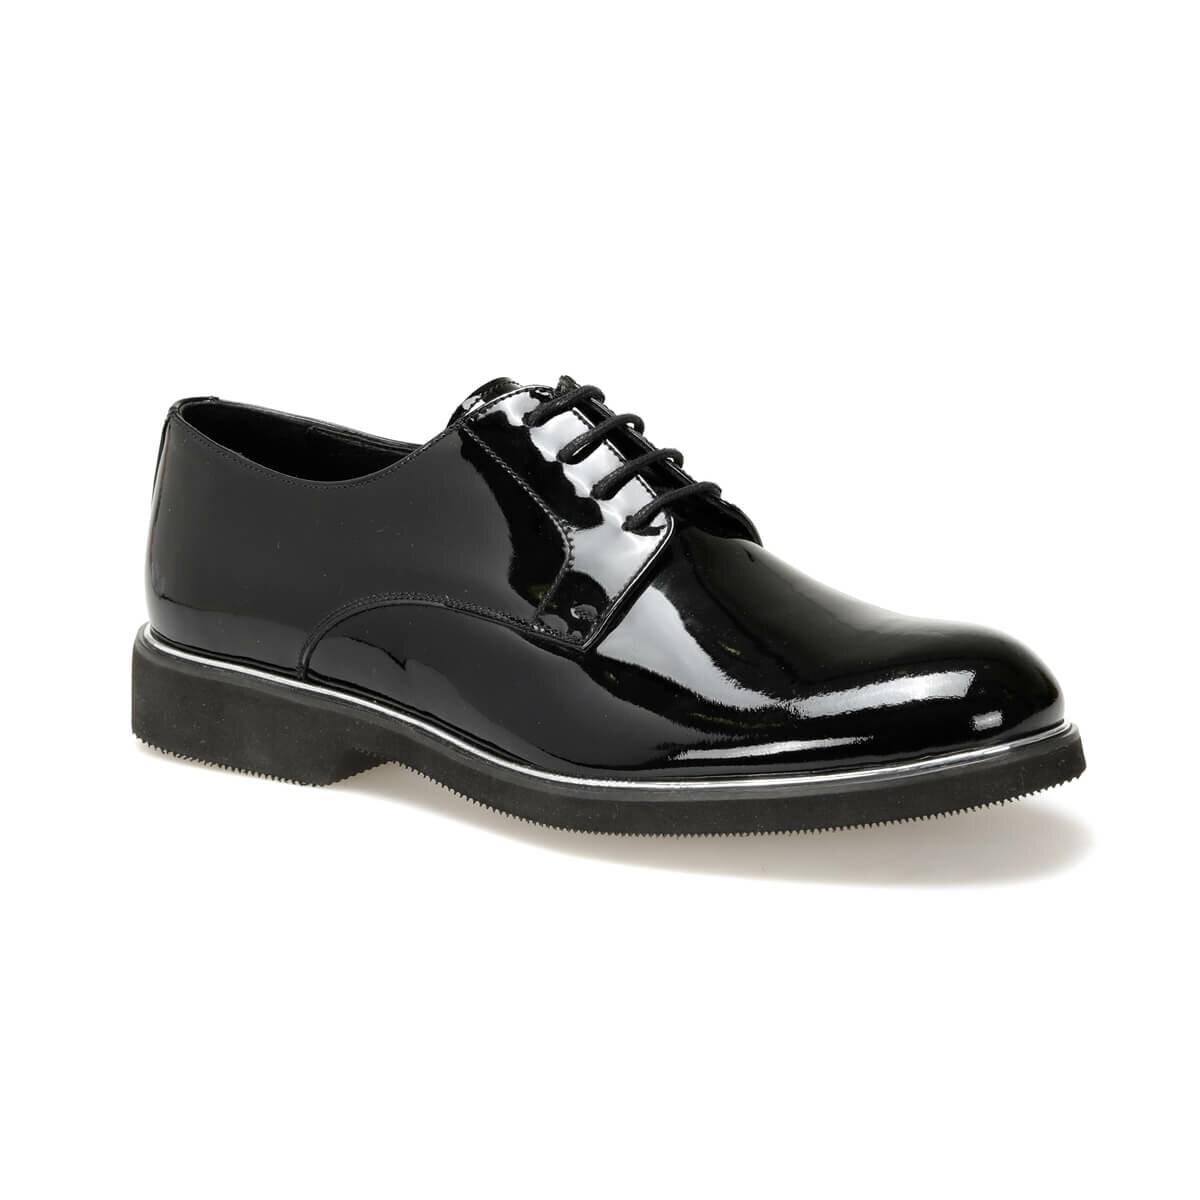 Flo Erg-965 Zwarte Mannen Klassieke Schoenen Jj-Stiller